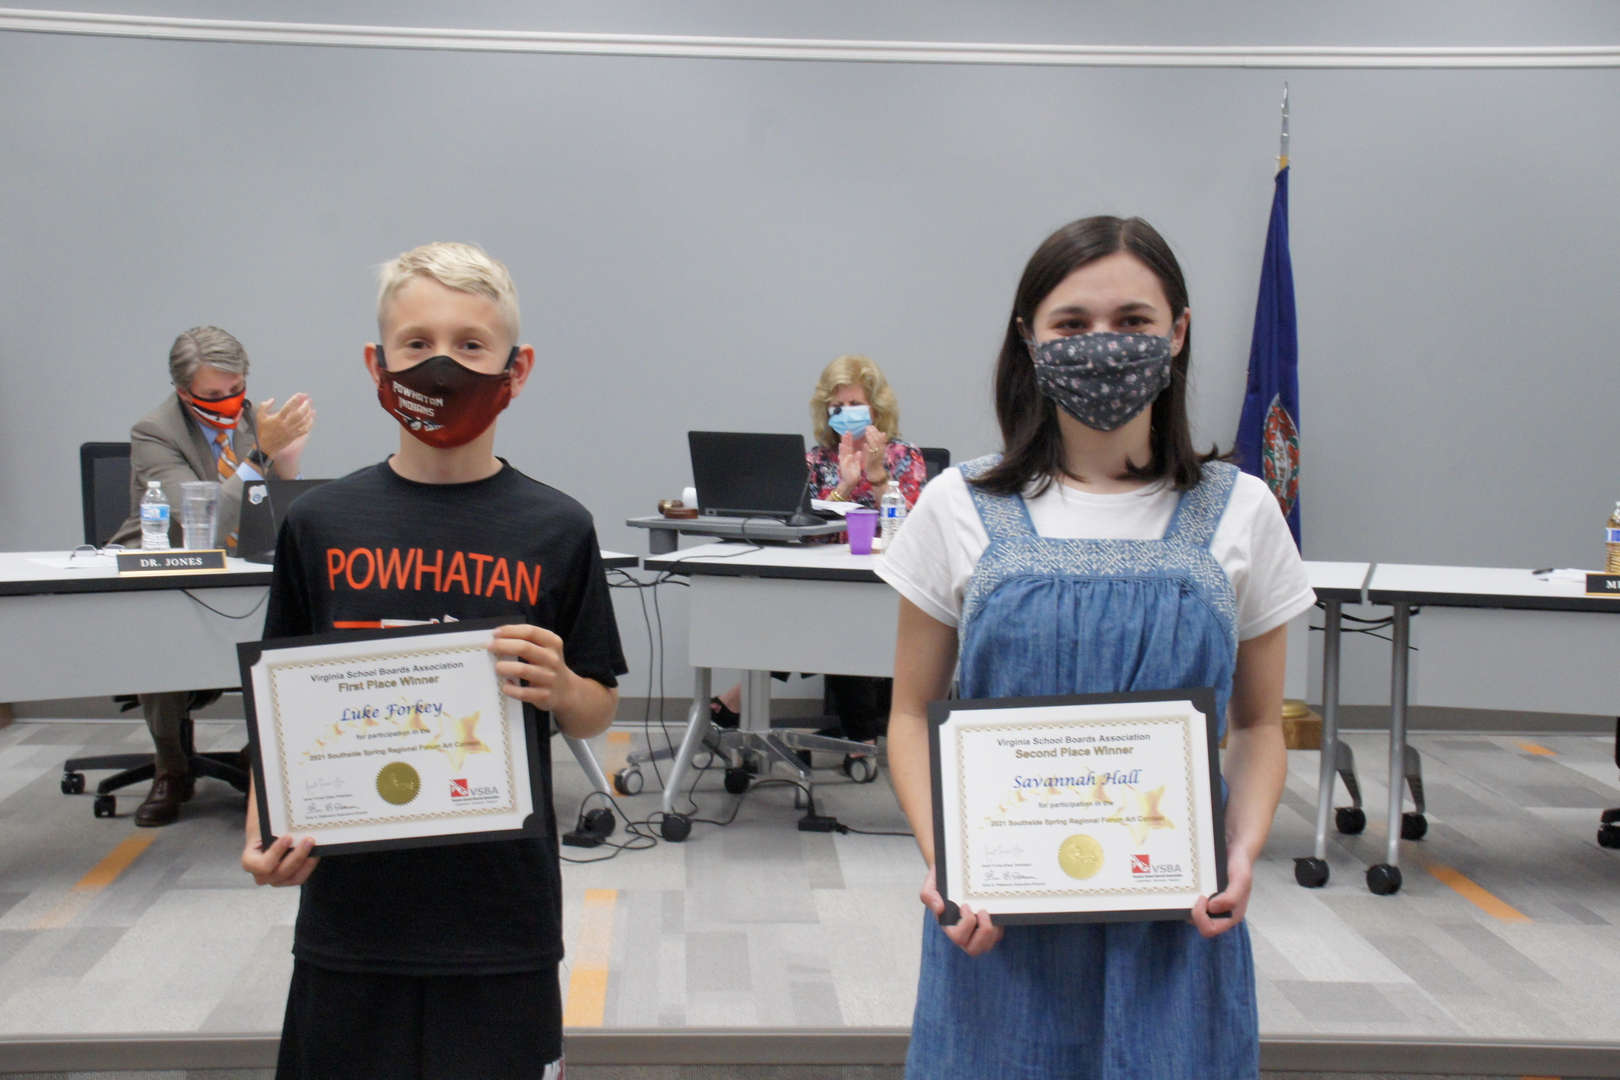 Luke Forkey & Savannah Hall receive VSBA Art awards